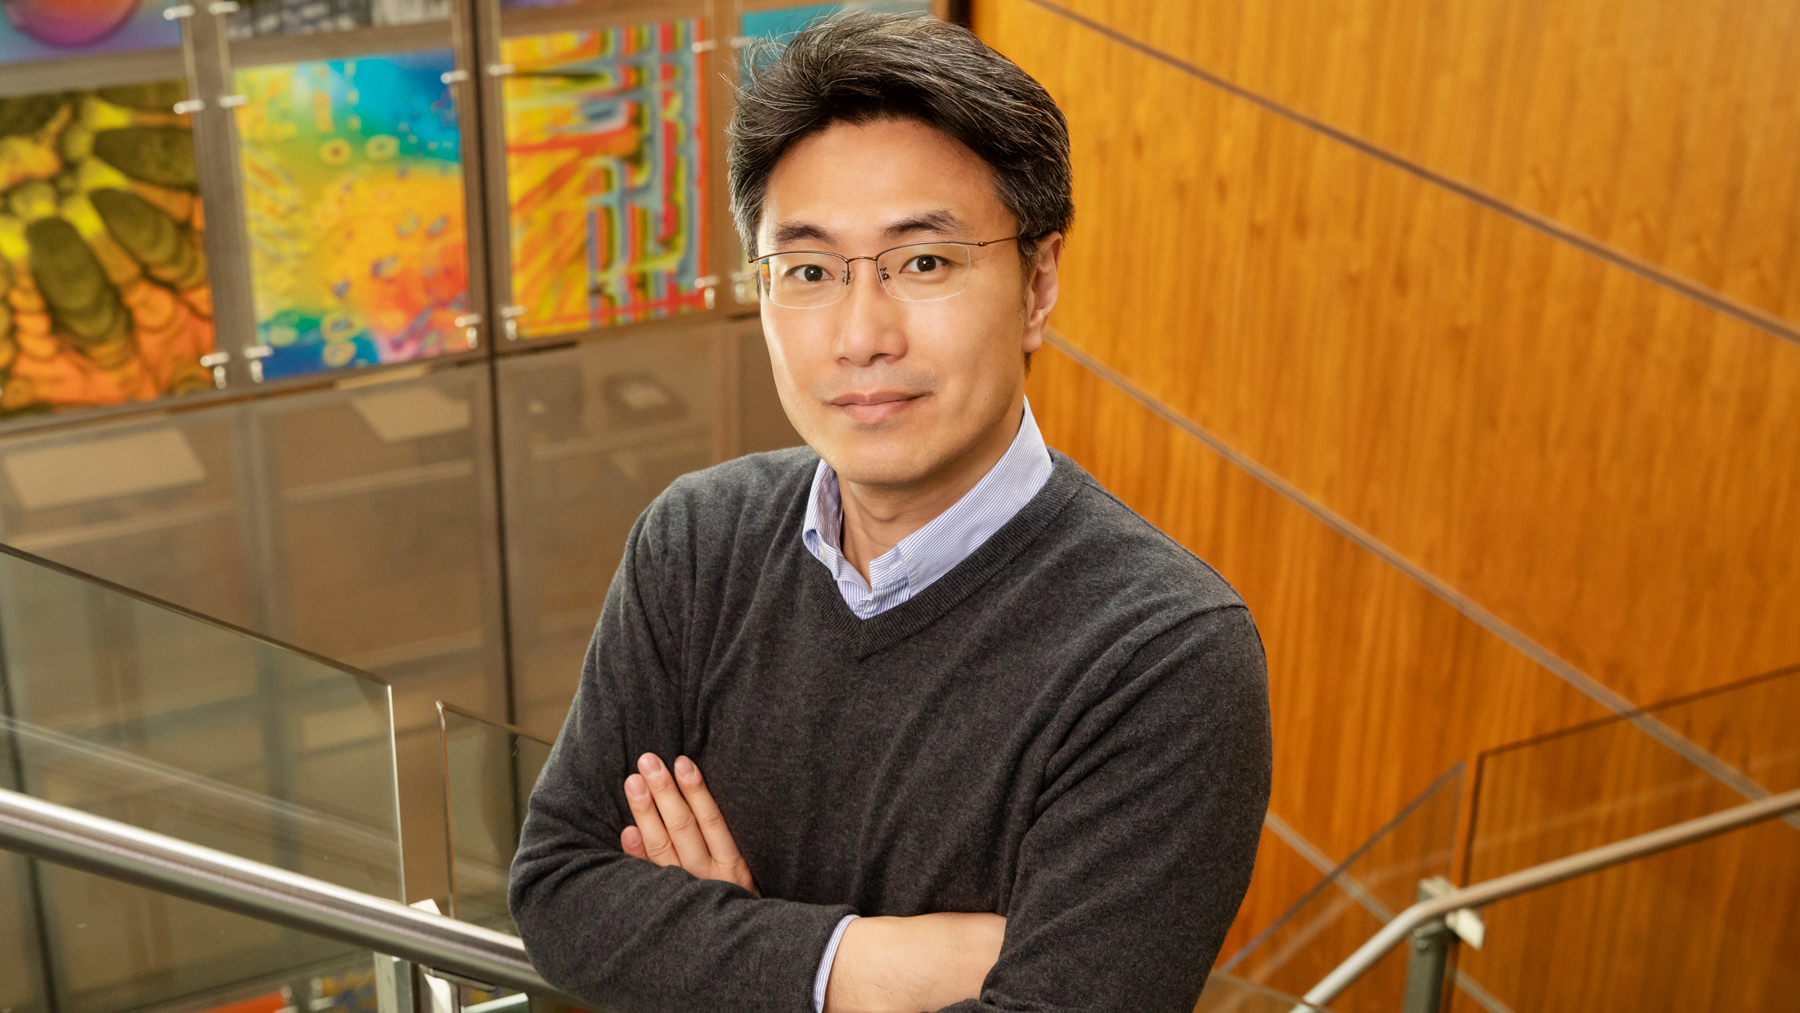 Professor Yong-Su Jin. Photo by L. Stauffer